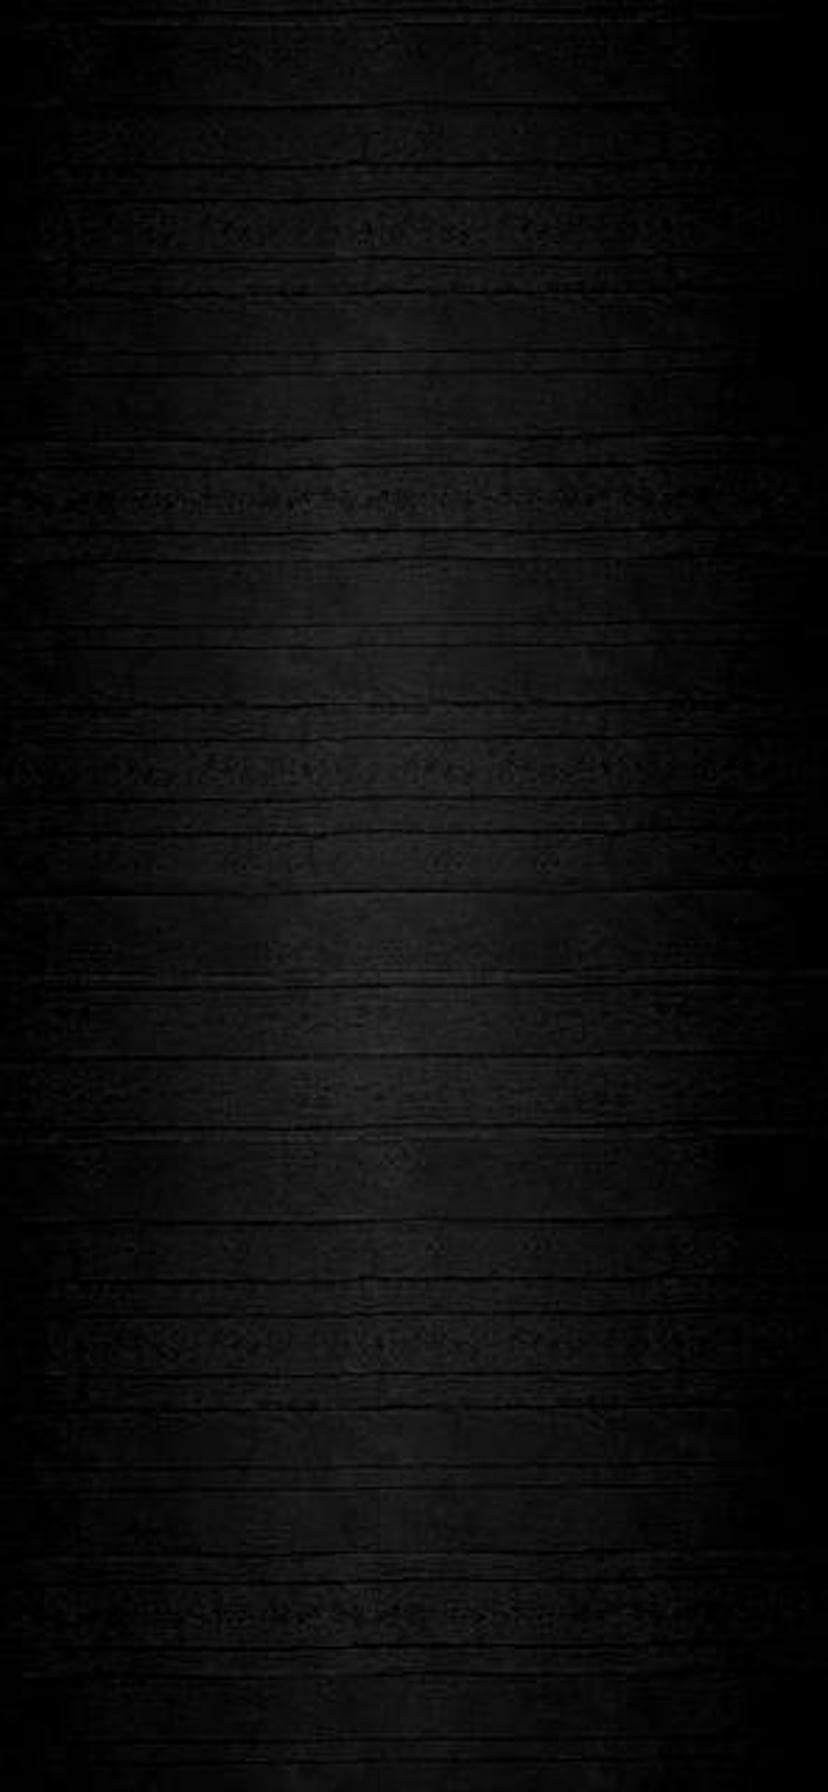 Iphone Xs Max Dark Hd 4k Wallpapers Wallpaper Cave